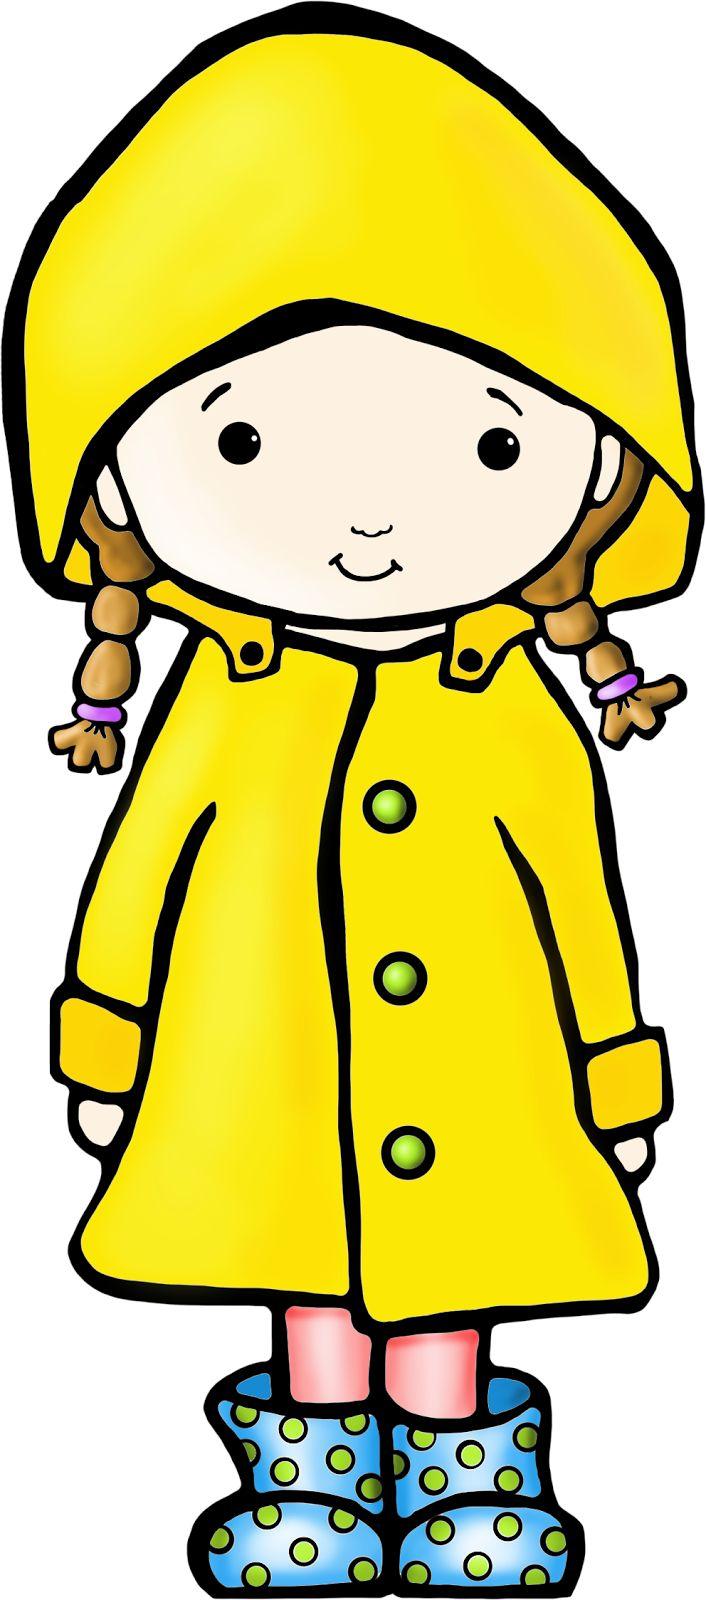 Rain coat clipart - Clipground